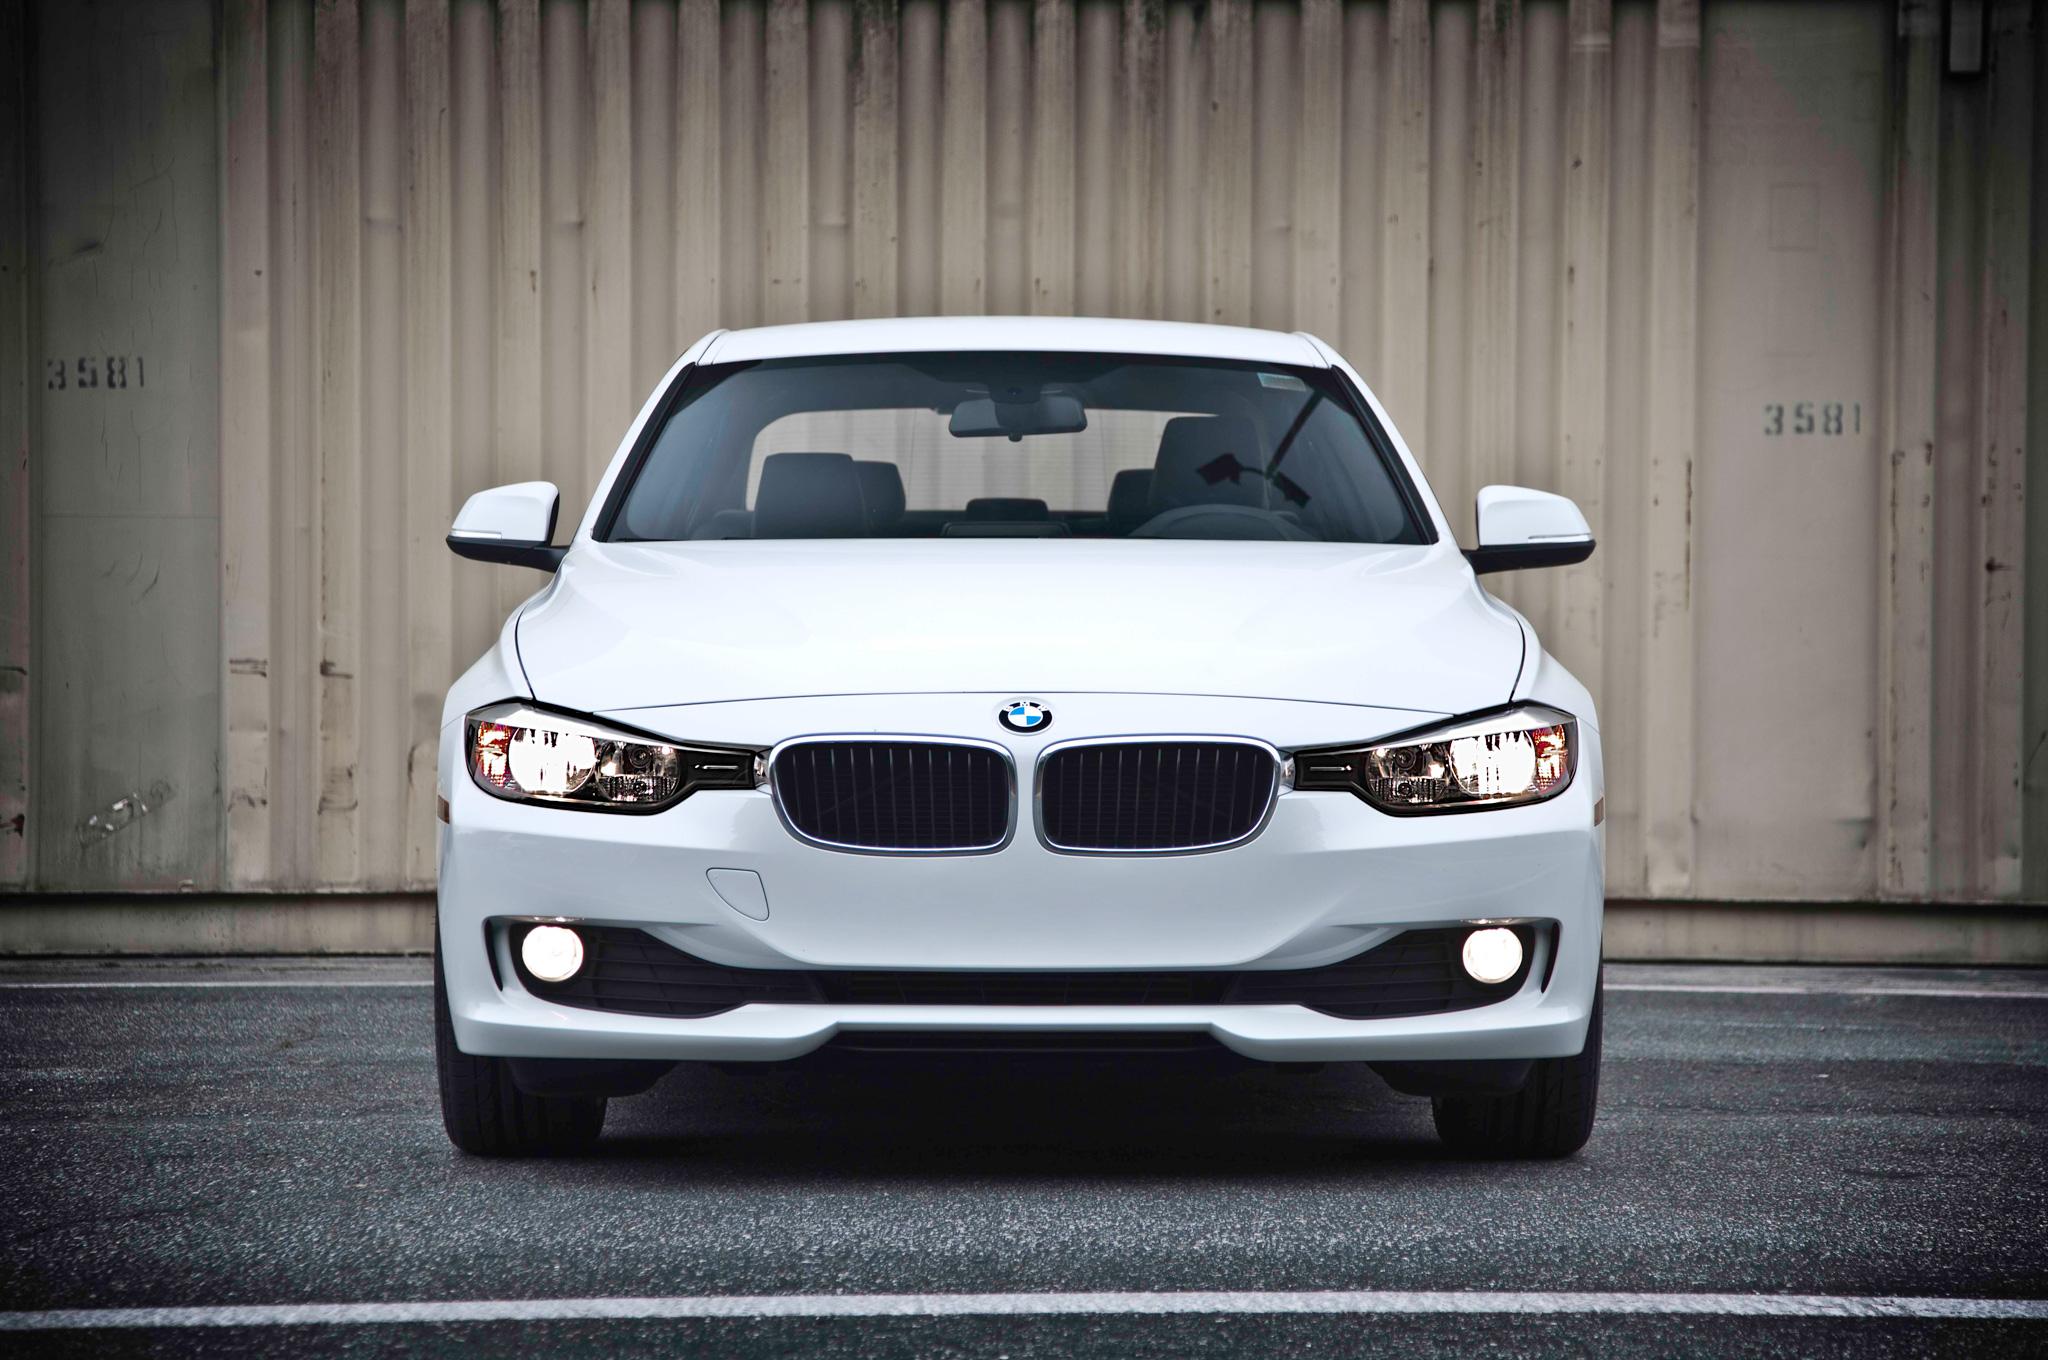 2013 BMW F30 320i Test Drive By MotorTrend Autoevolution